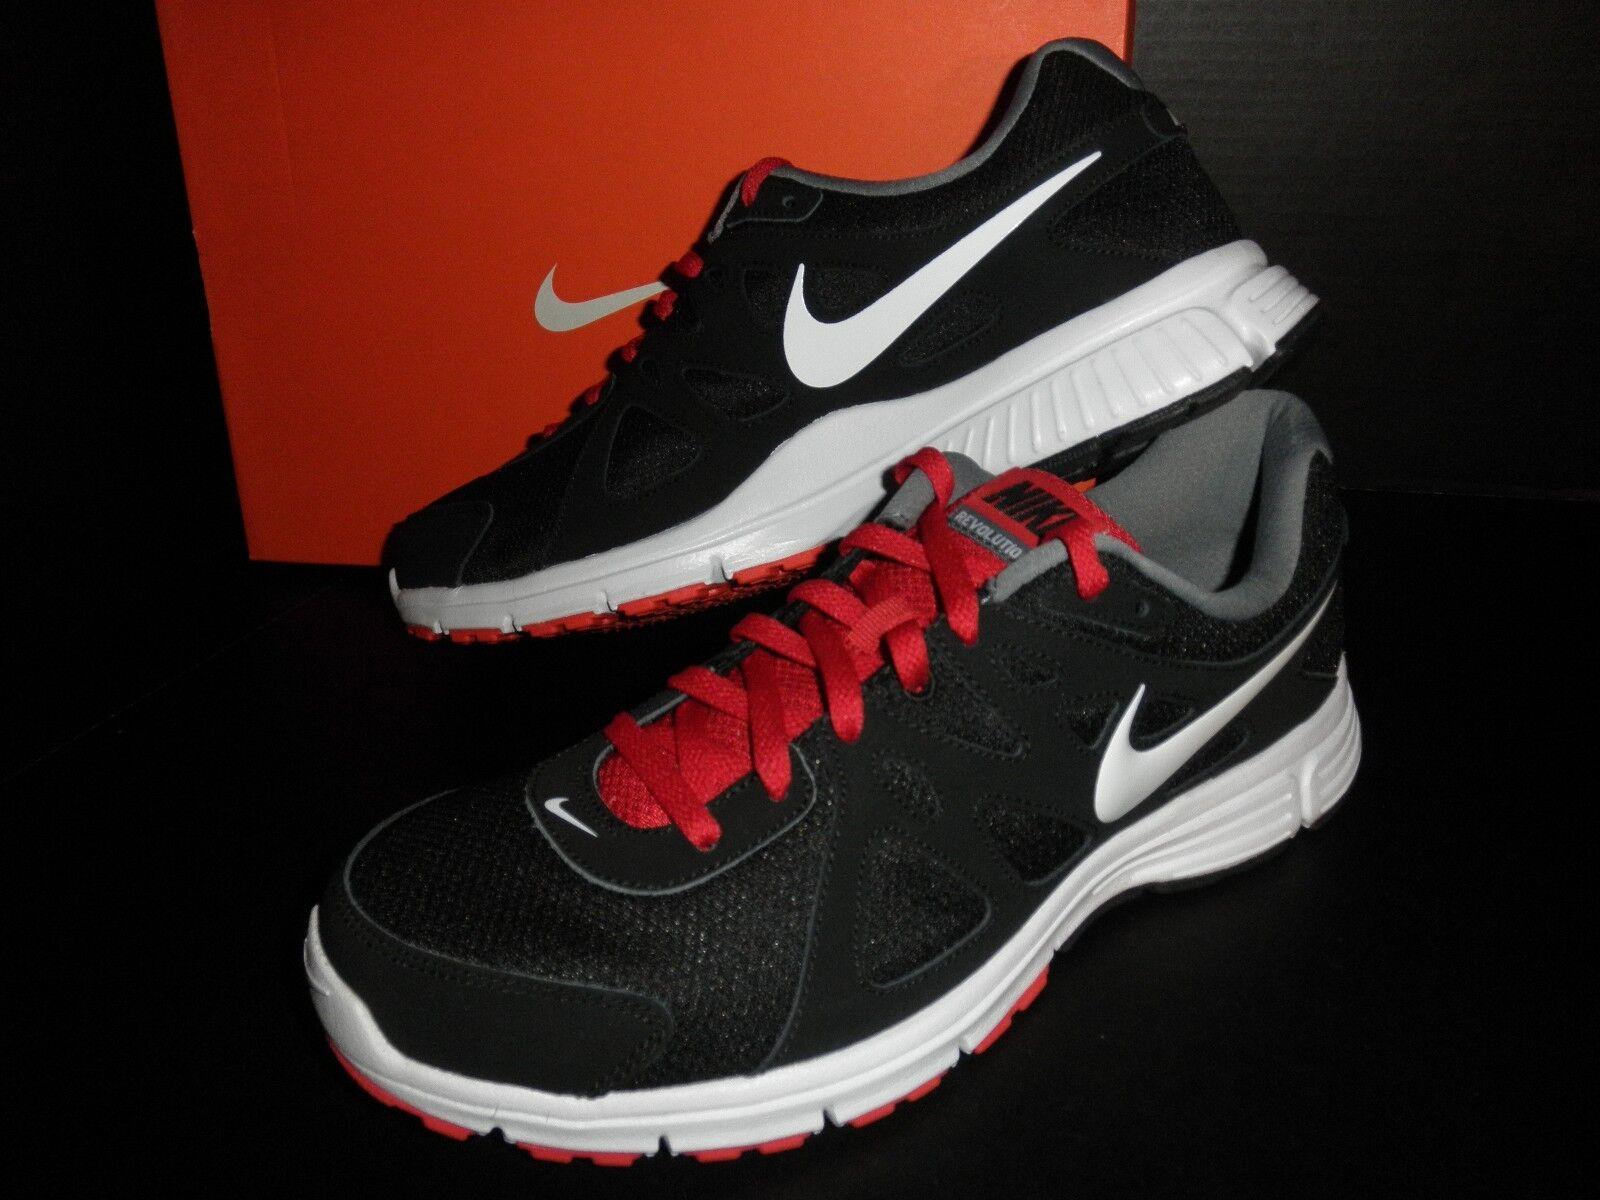 Nike Performance Reax Run 8 High Performance Nike Running Zapatos Hombres Ebay 4006e1